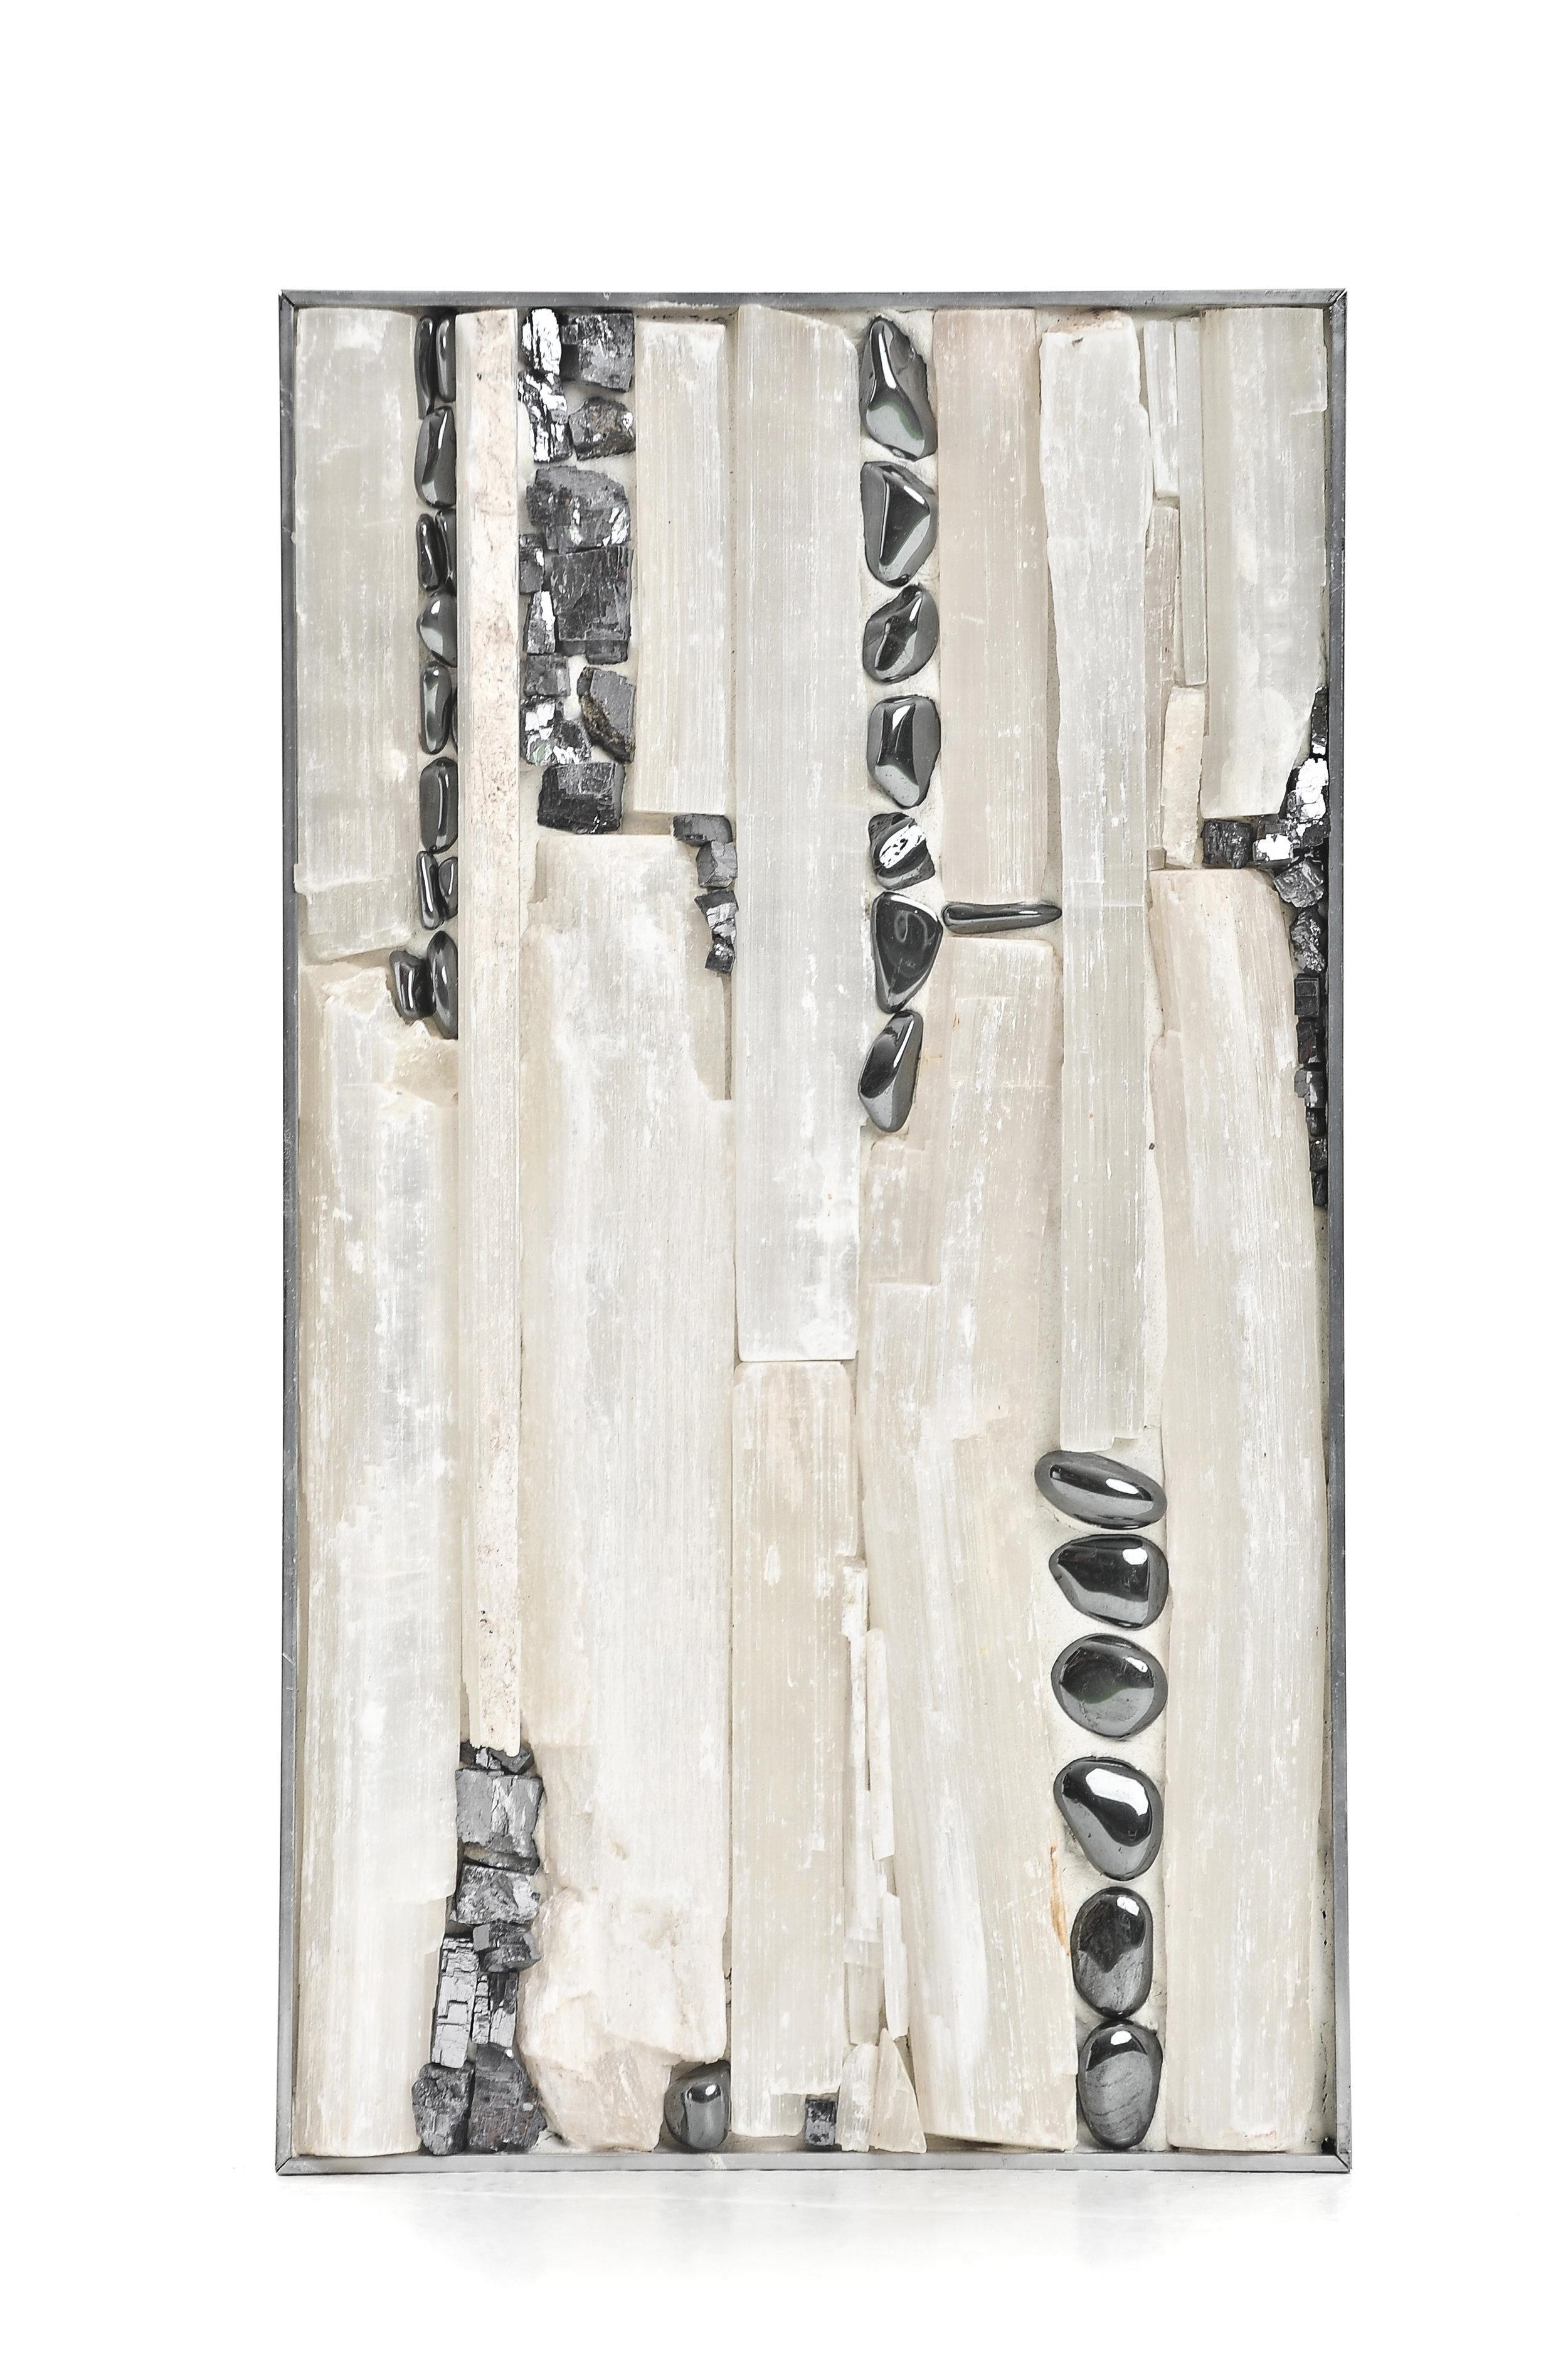 Sticks and Stones DSC_3432.JPG